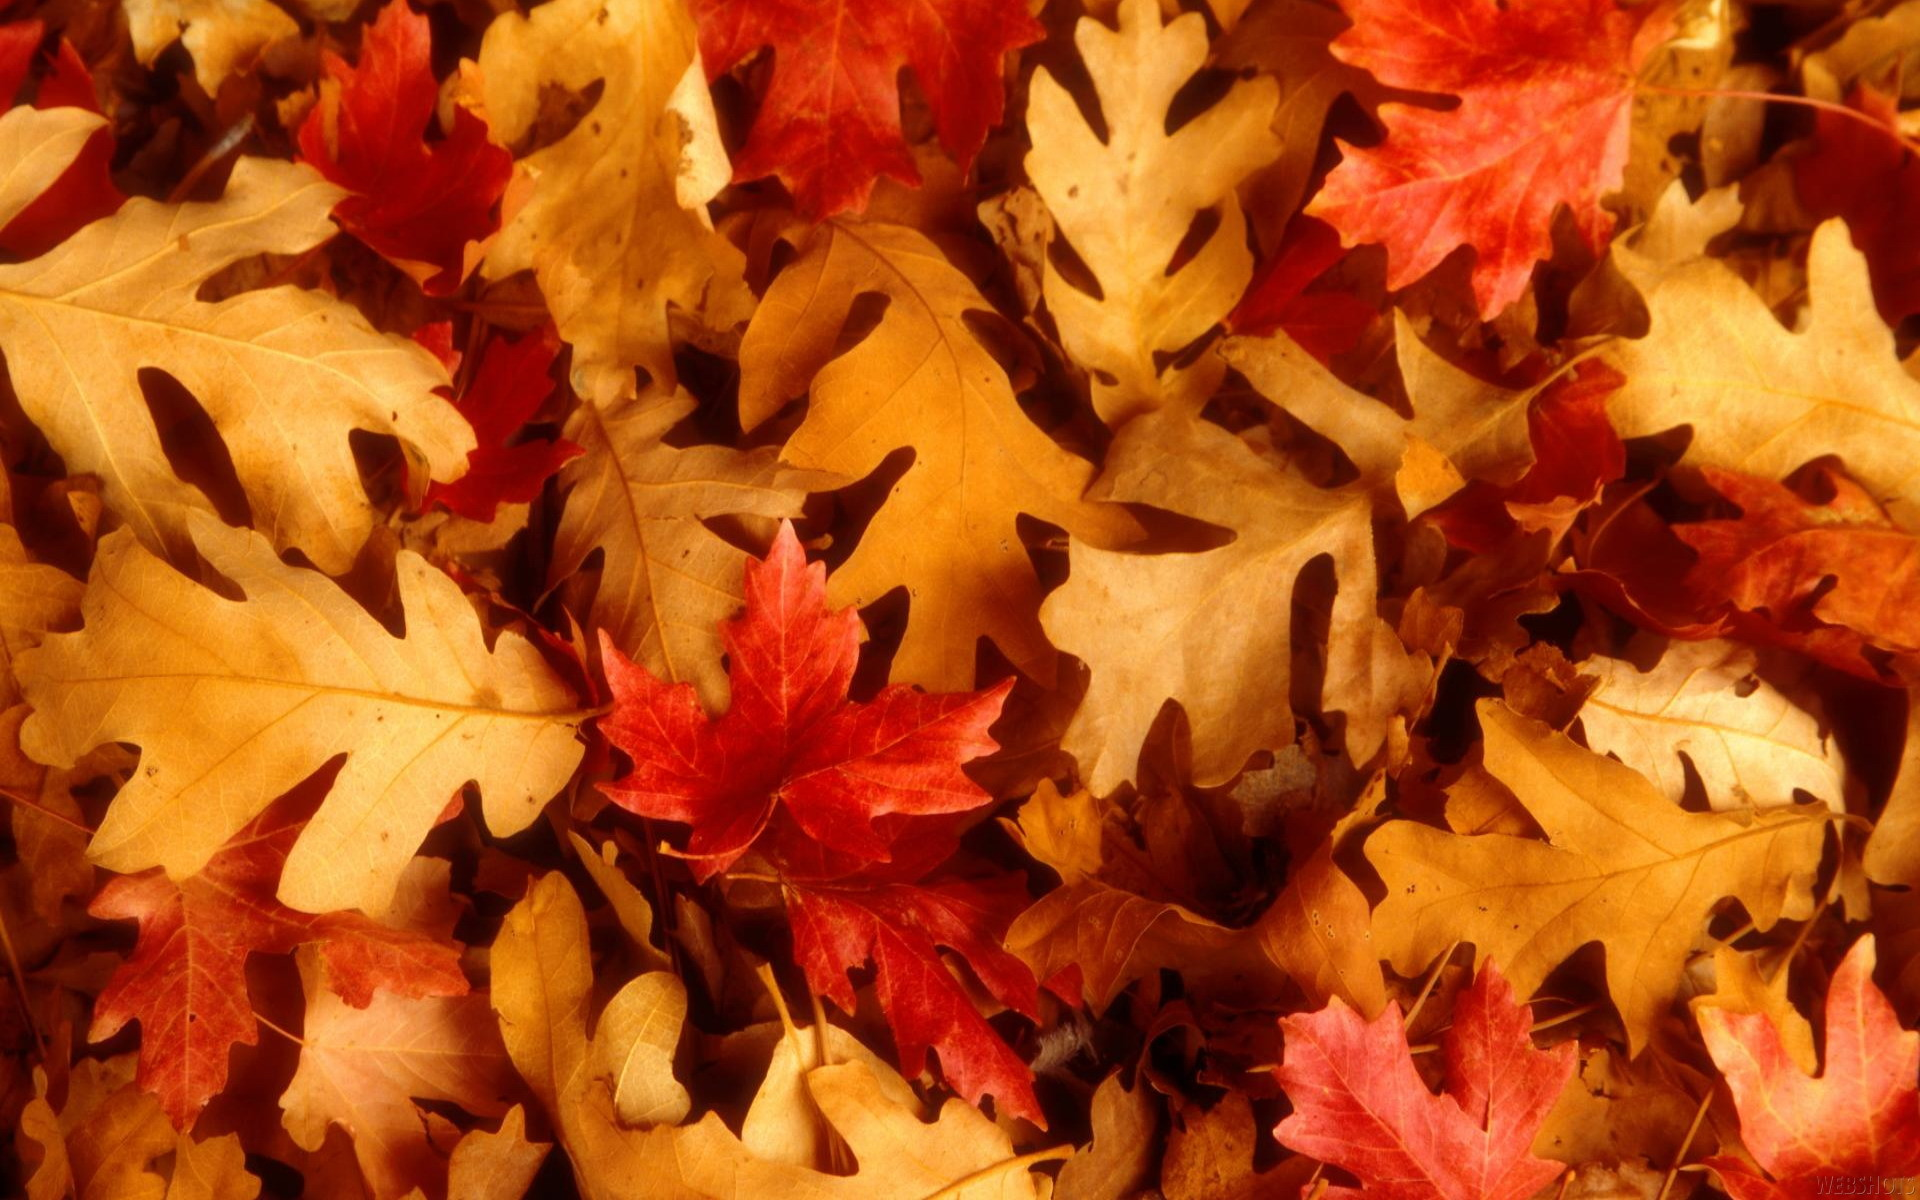 Autumn Leaves Wallpaper Autumn, Leaves, Fallen, Leaves